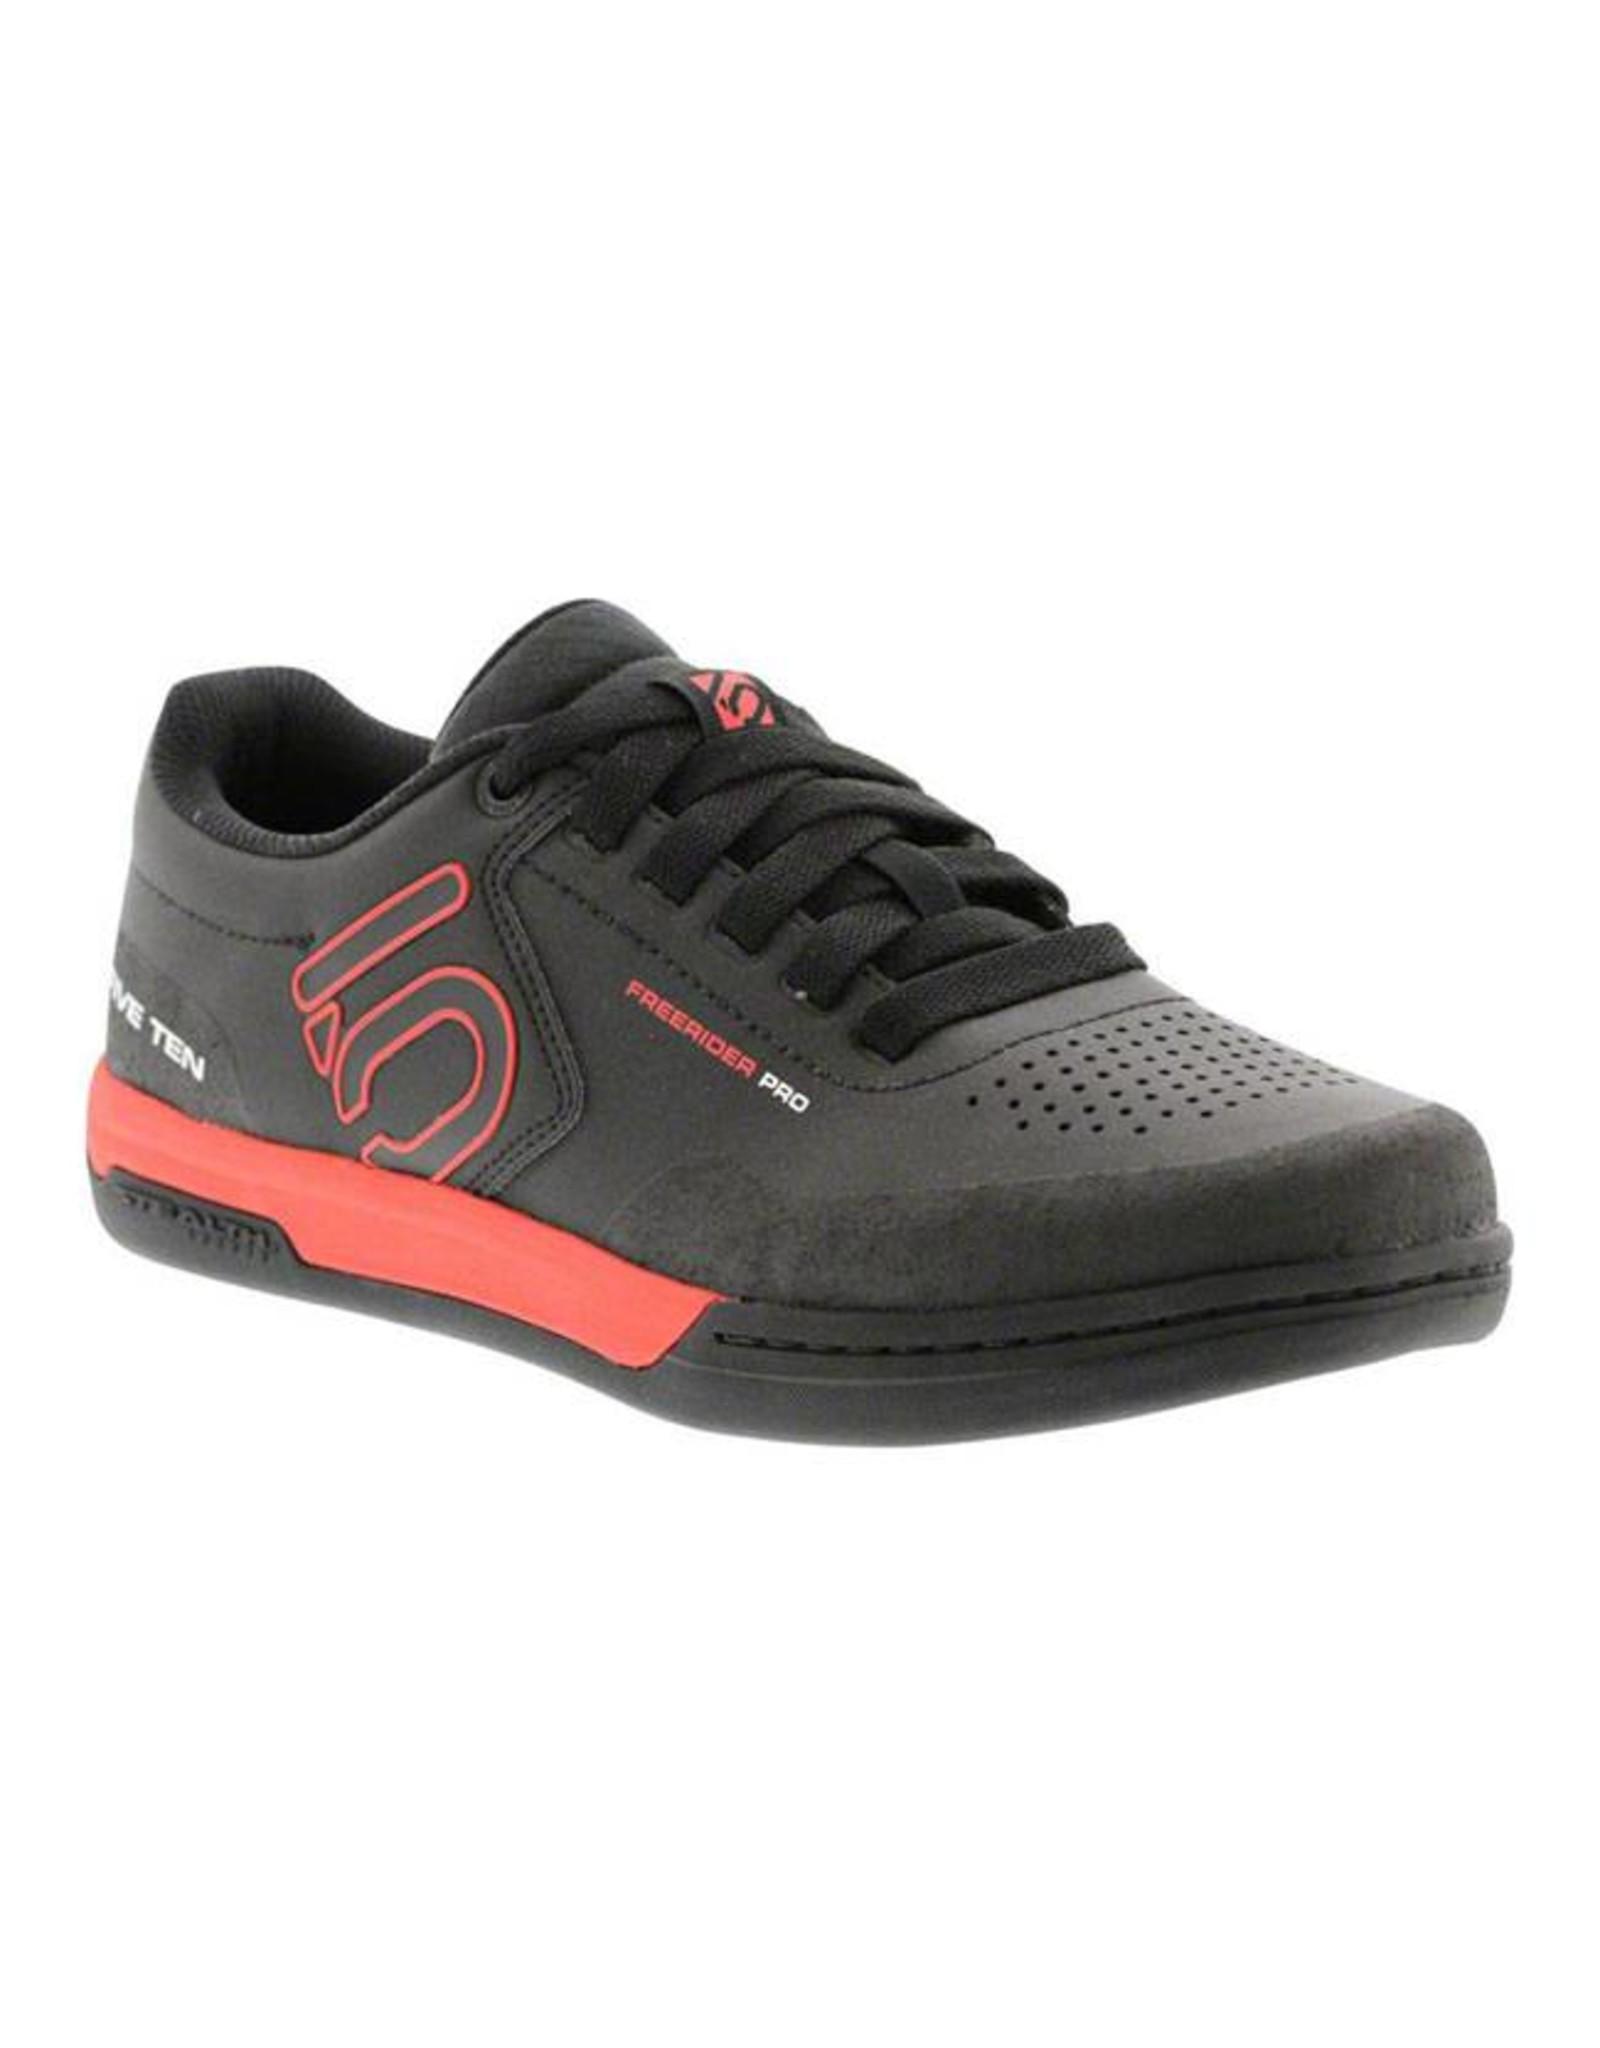 Five Ten Five Ten Freerider Pro Men's Flat Pedal Shoe: Black 8